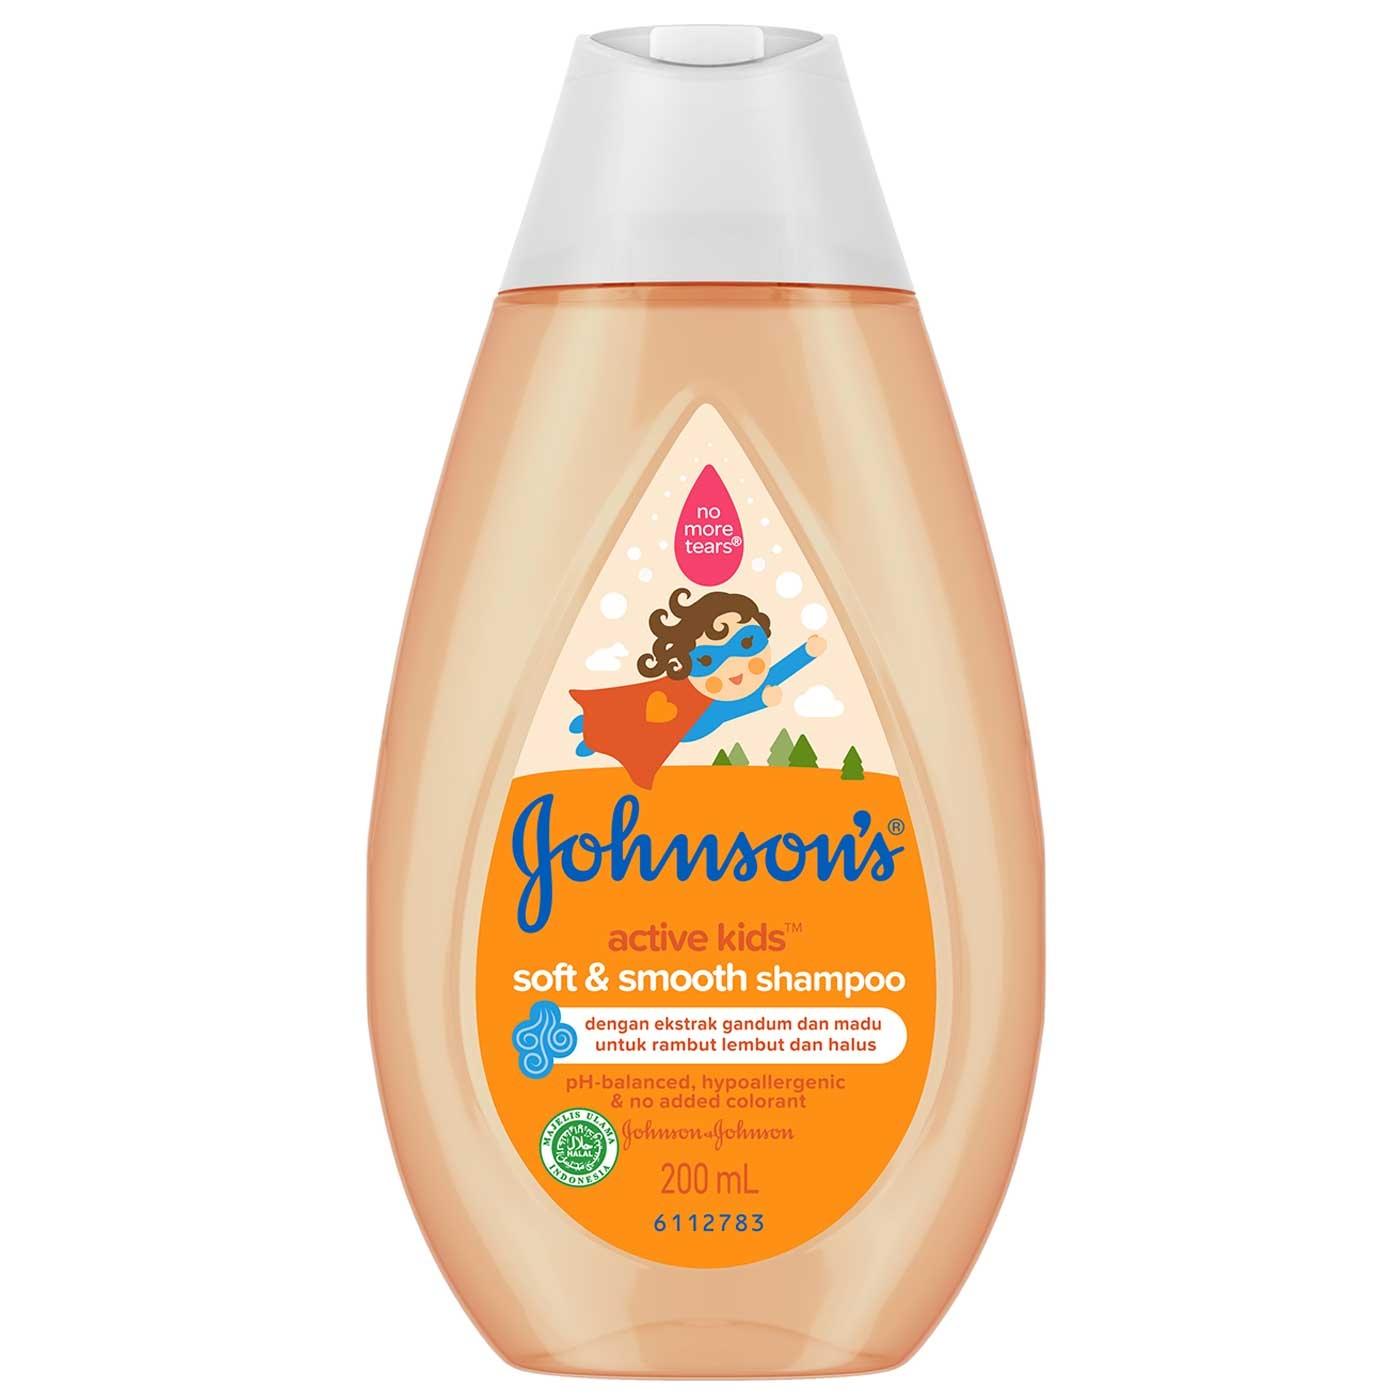 JOHNSON'S Active Kids Soft and Smooth Shampoo 200 ml 1